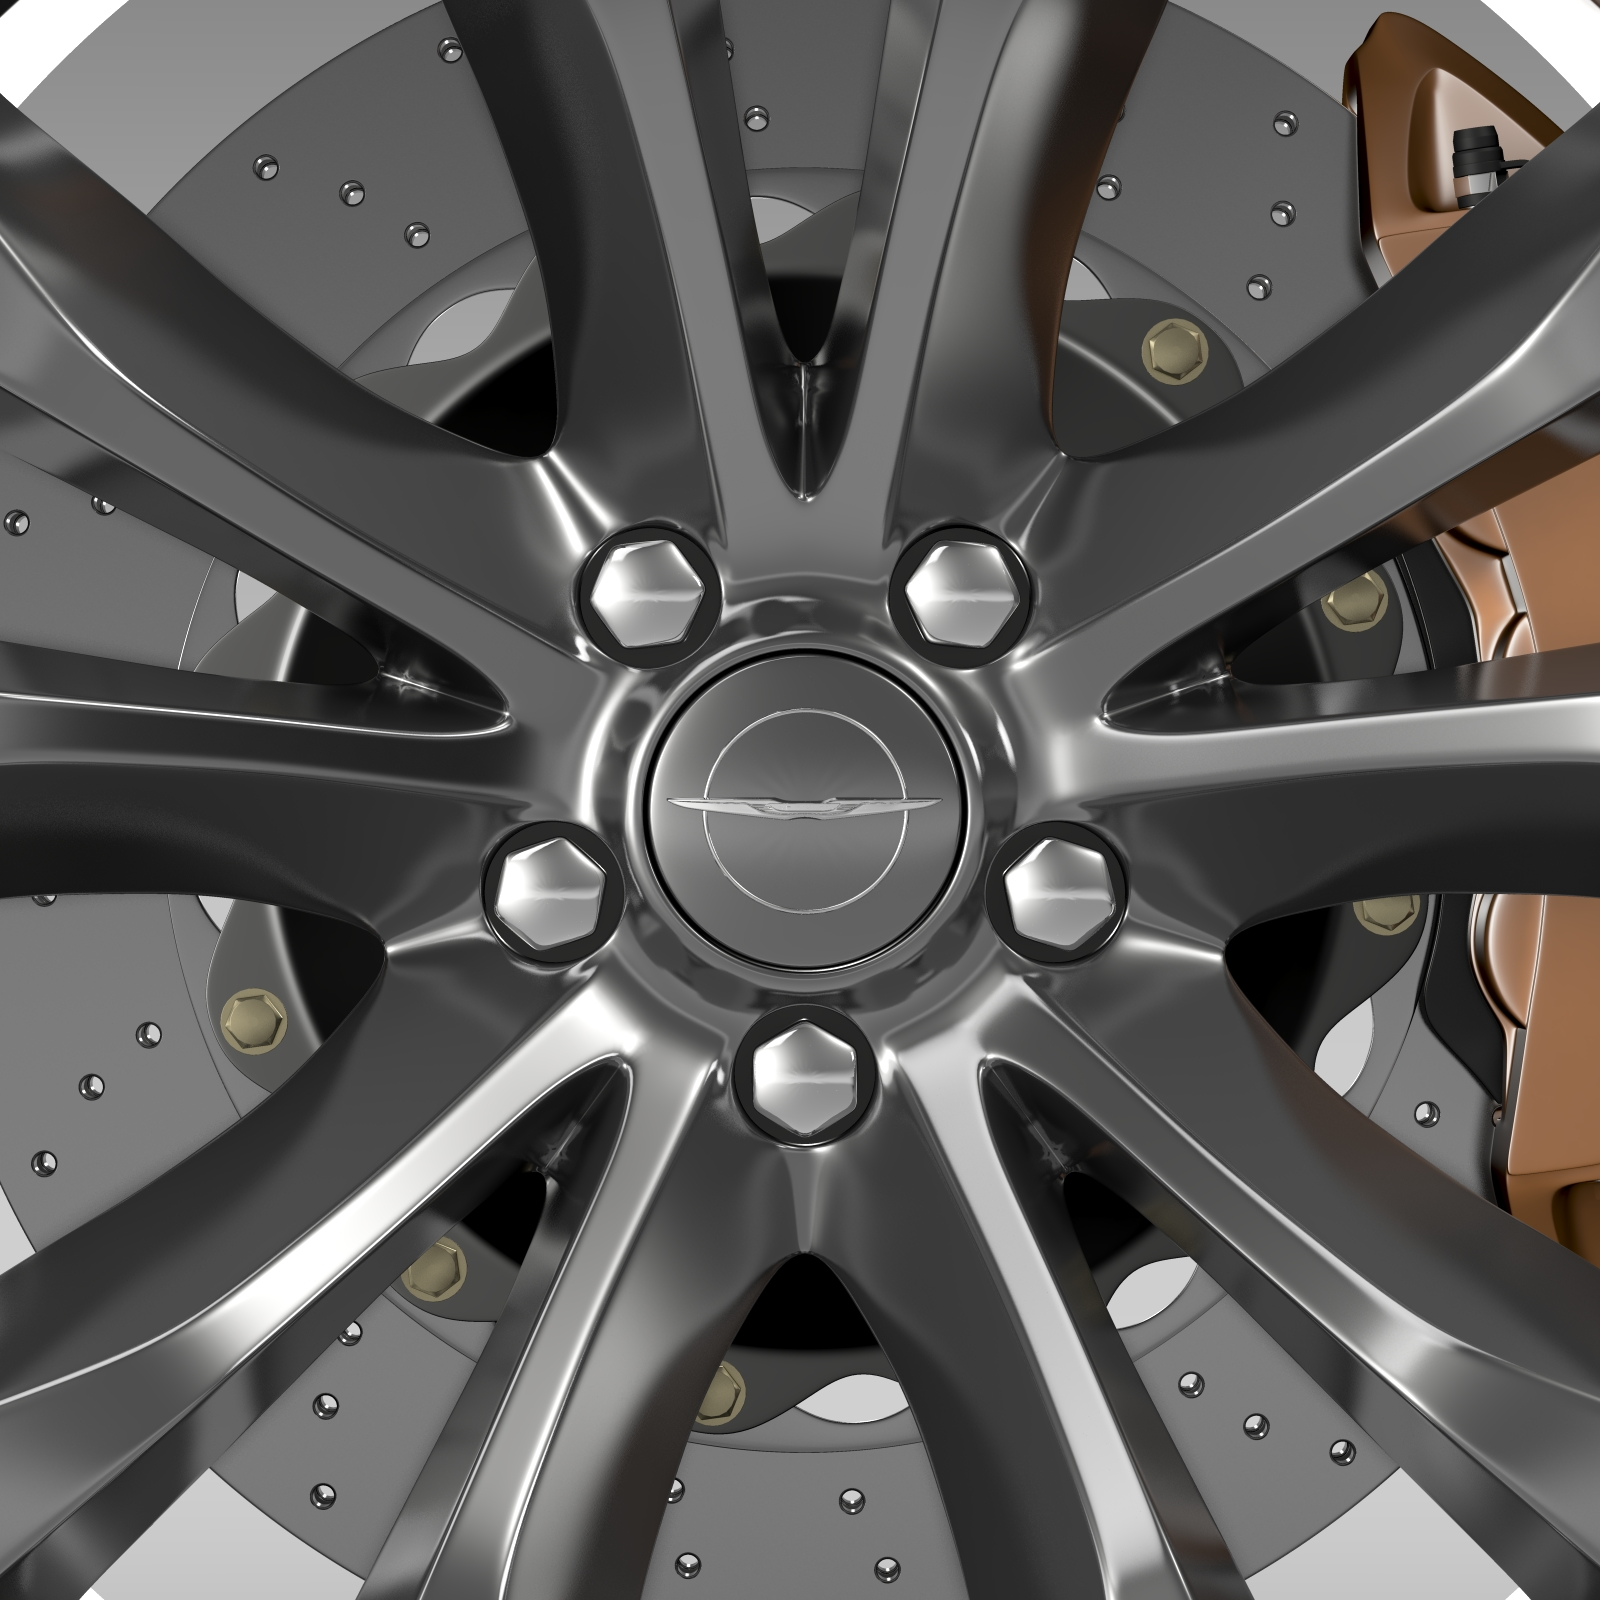 chrysler 300c platinum 2015 wheel 3d model 3ds max fbx c4d lwo ma mb hrc xsi obj 212780